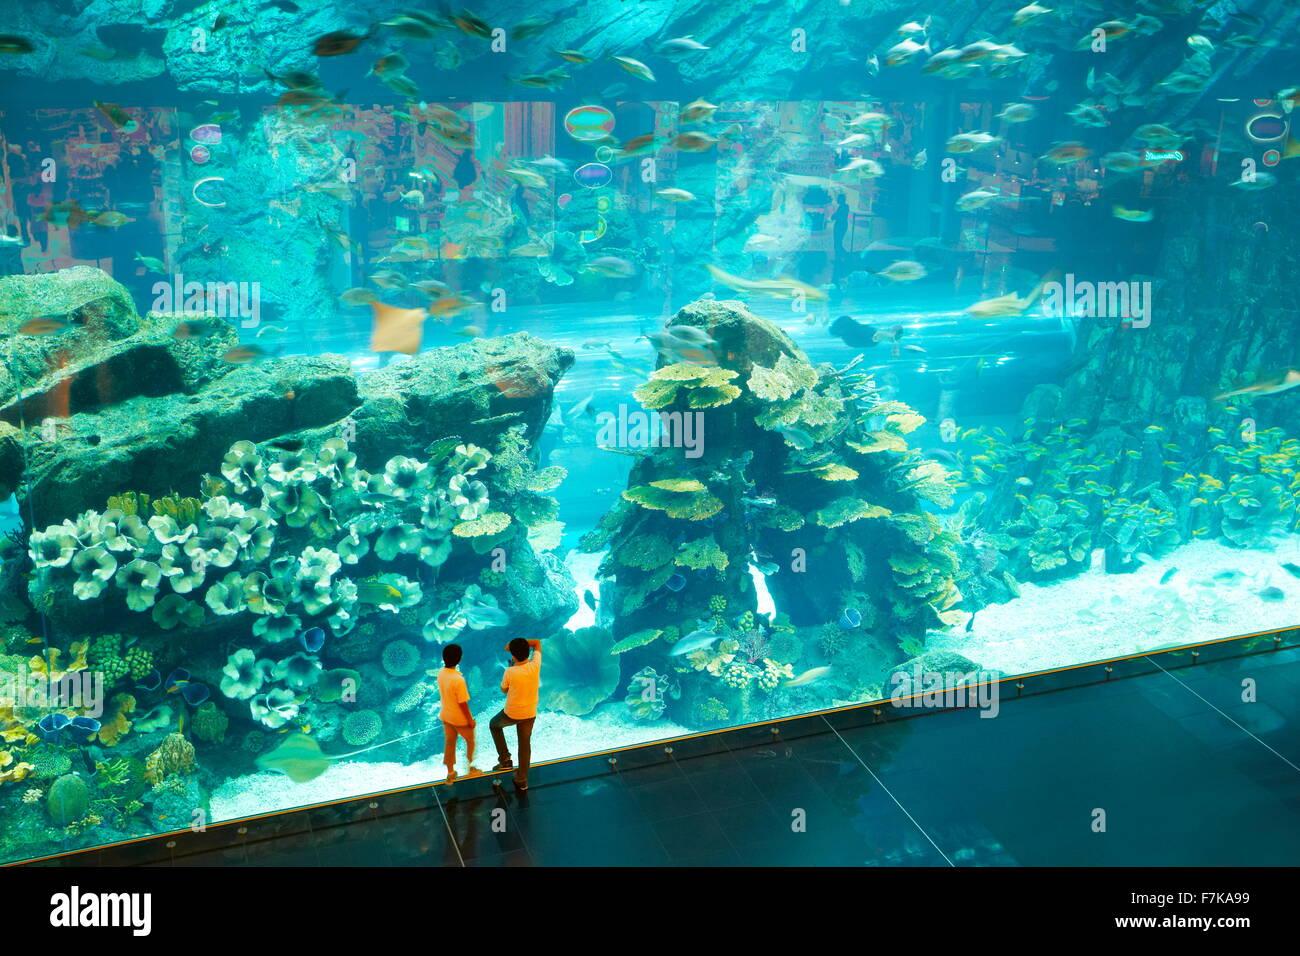 Niños mirando el acuario Dubai Mall, Dubai, Emiratos Árabes Unidos, Oriente Medio Imagen De Stock